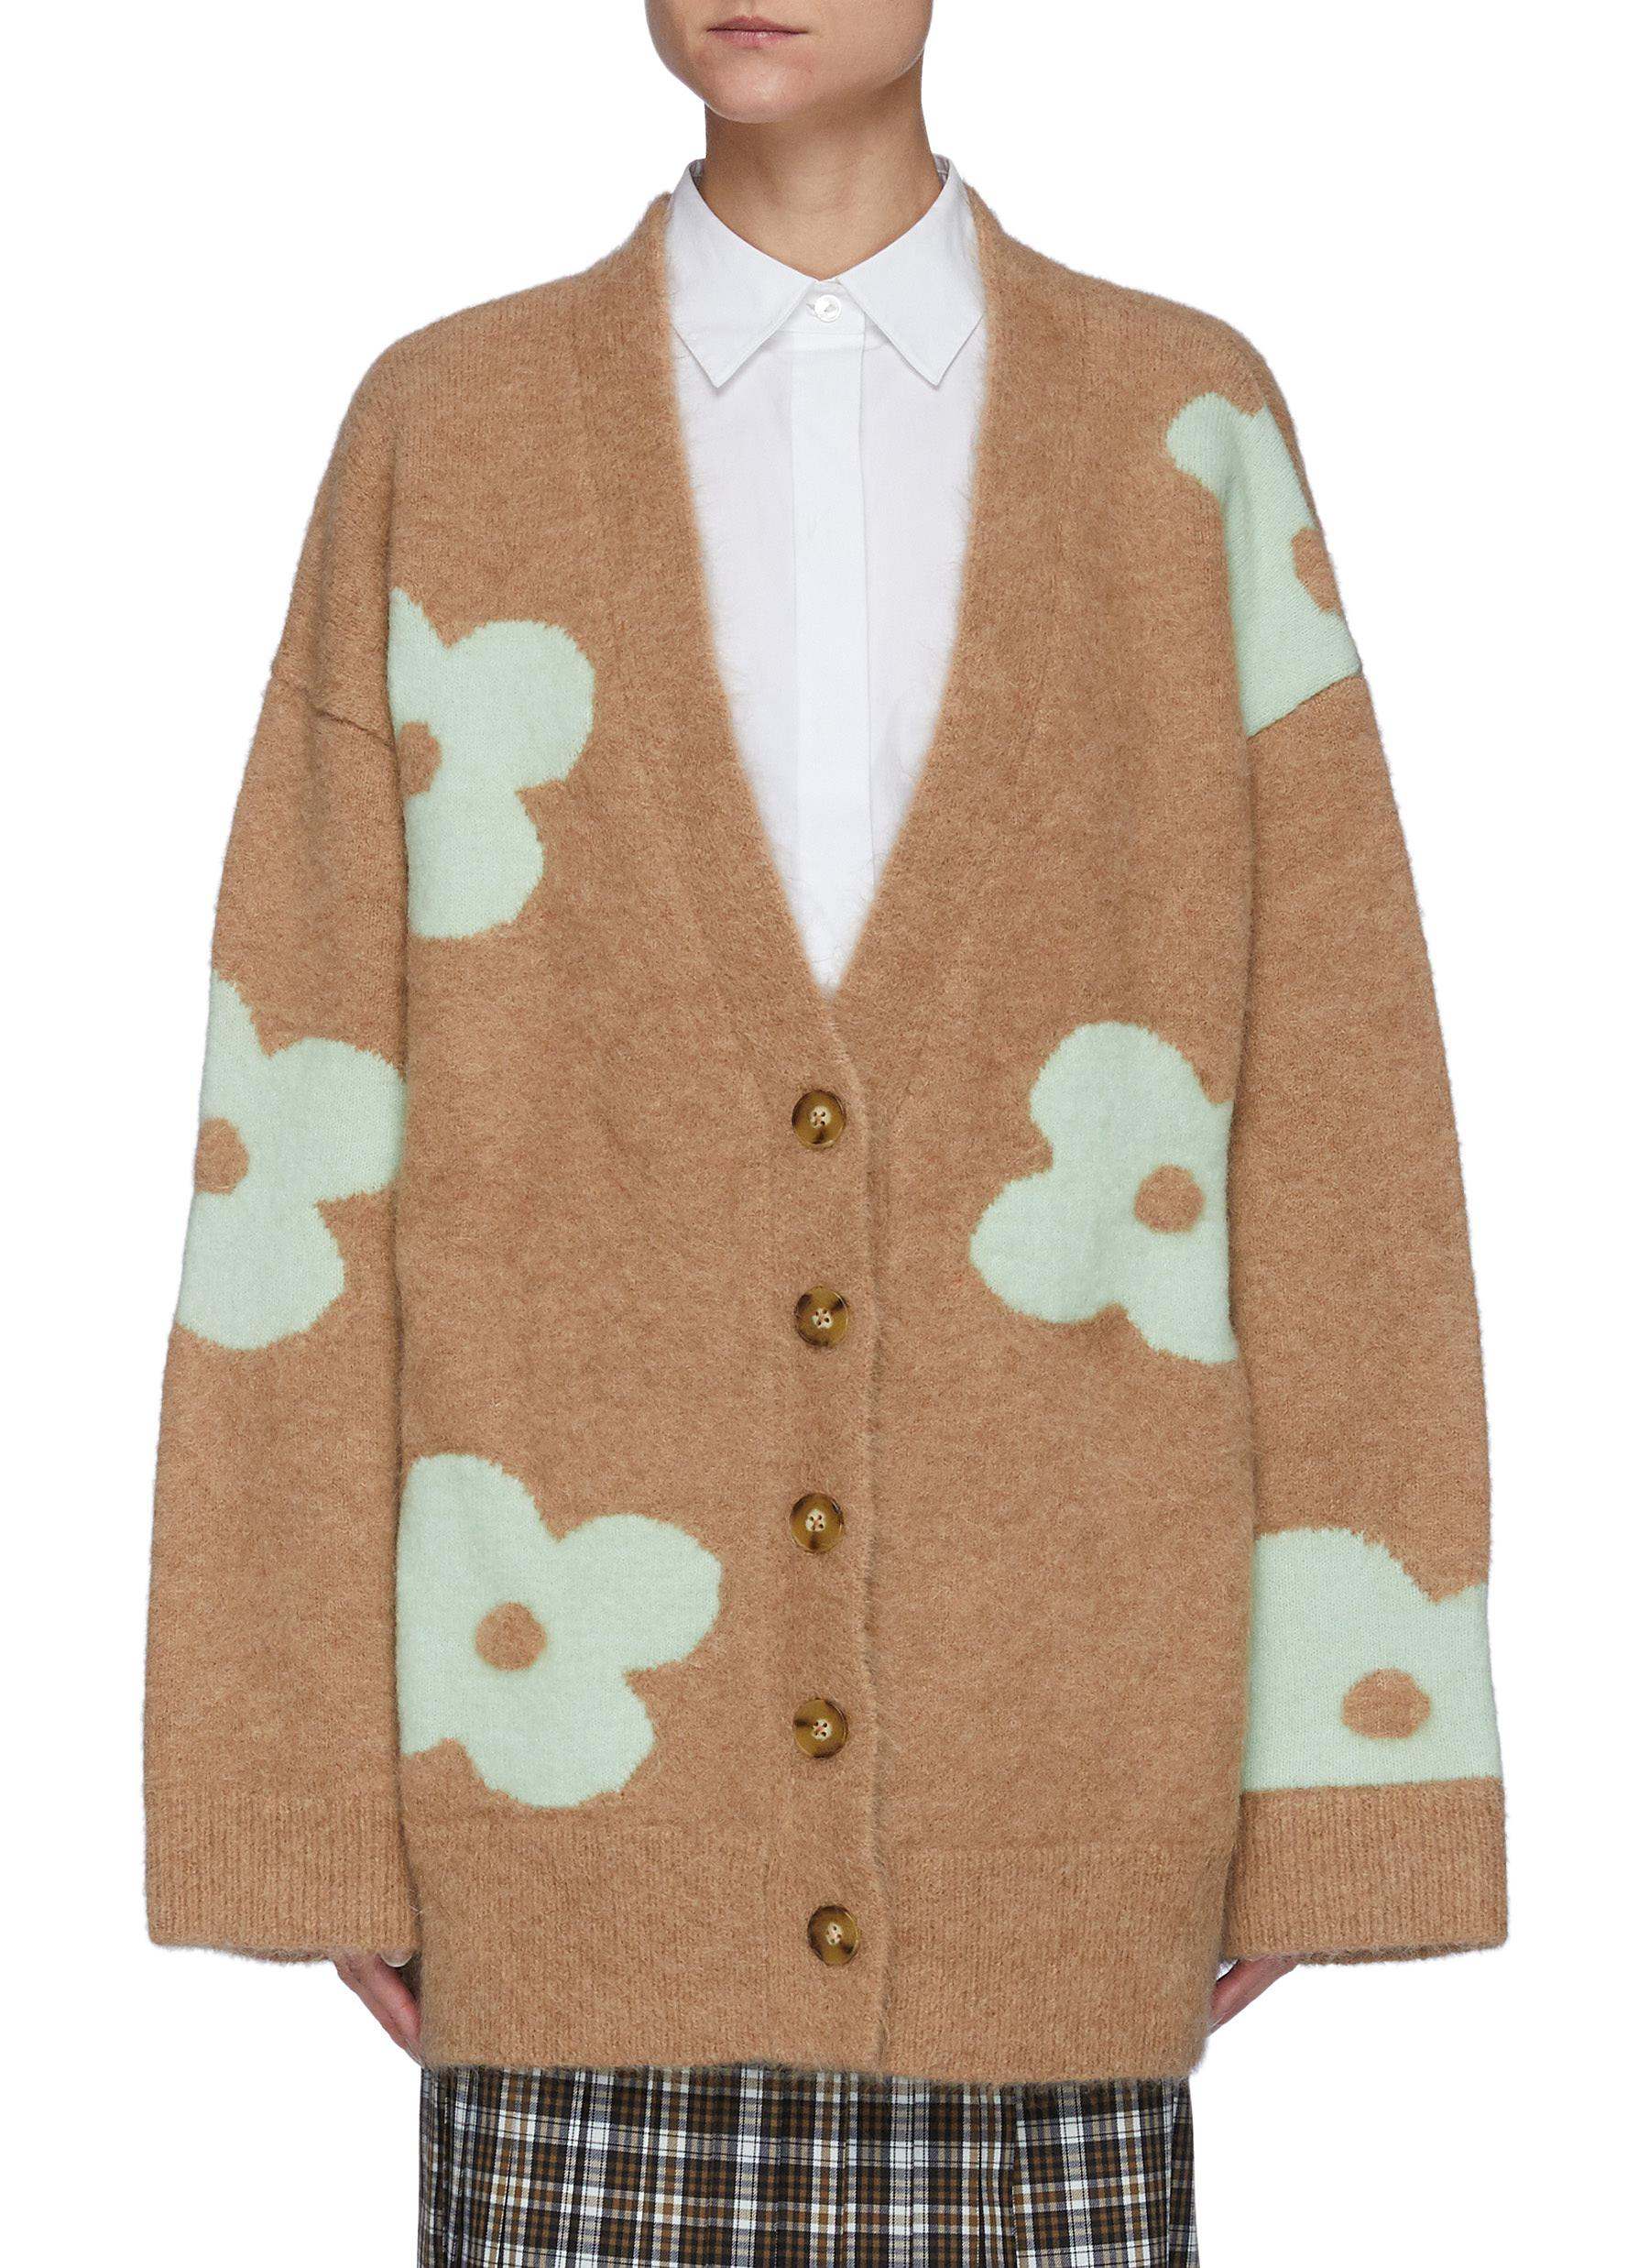 Oversized Floral Jacquard Alpaca Wool Blend Cardigan